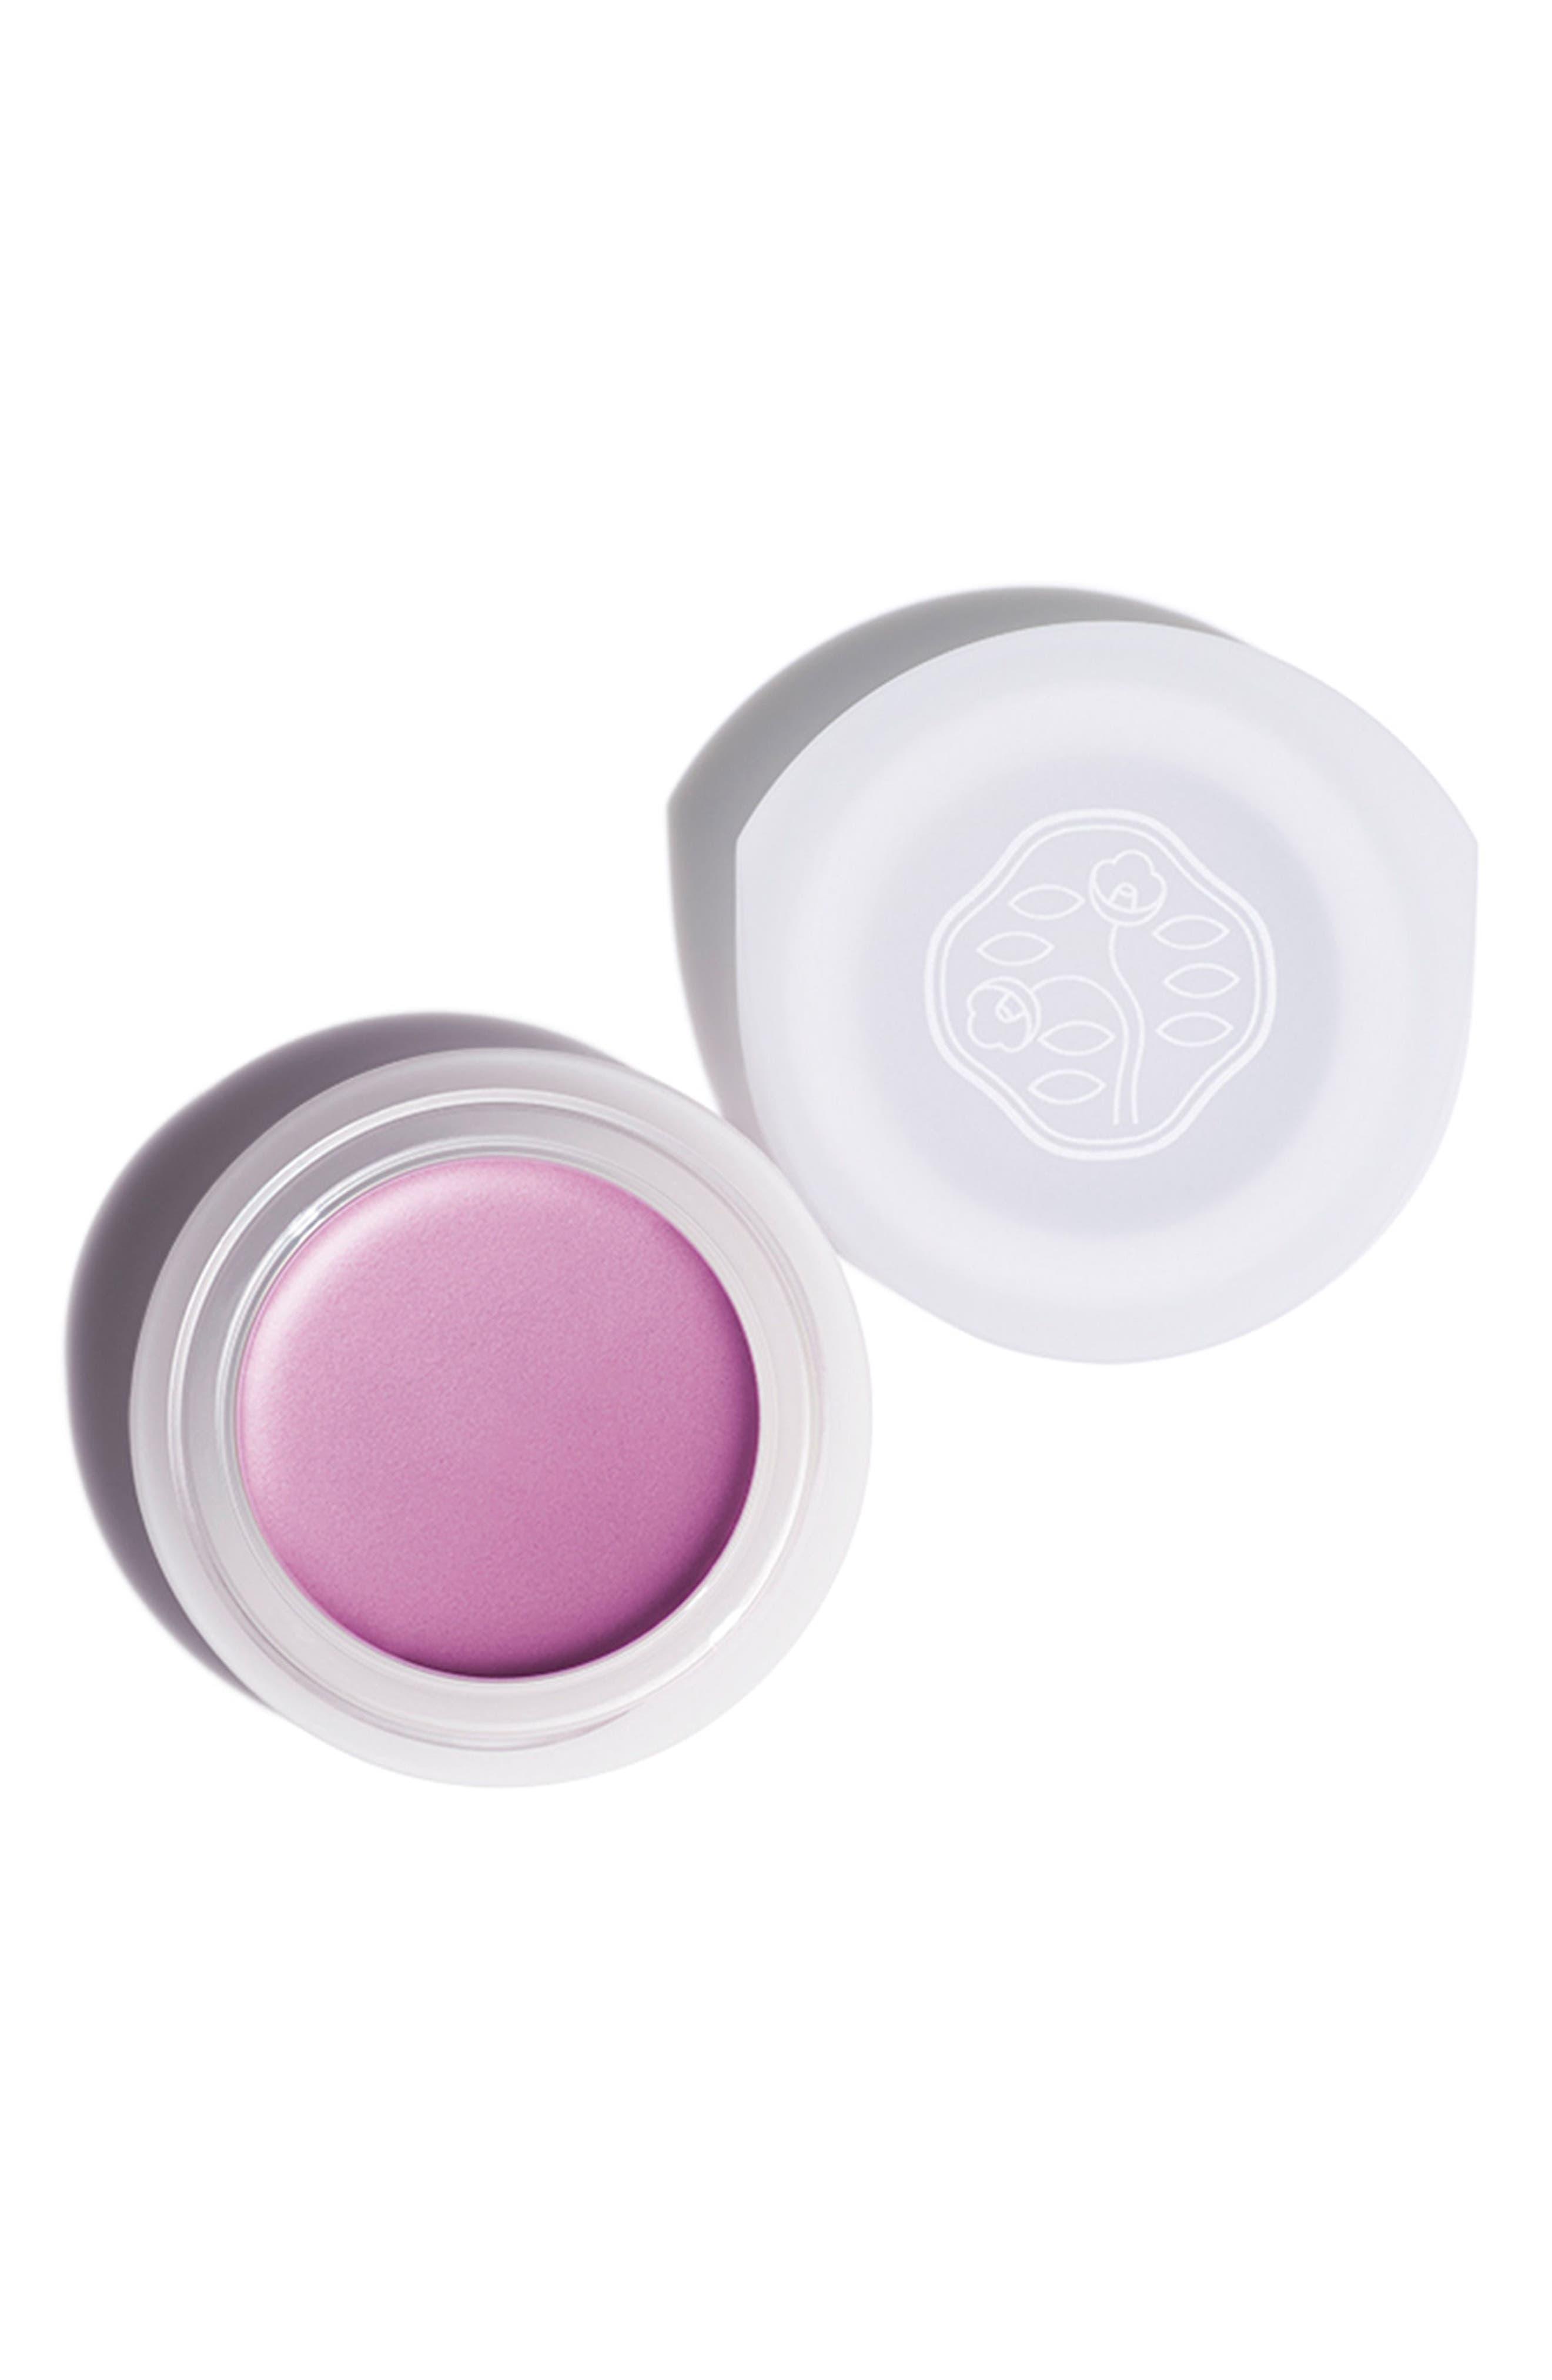 Main Image - Shiseido Paperlight Cream Eye Color